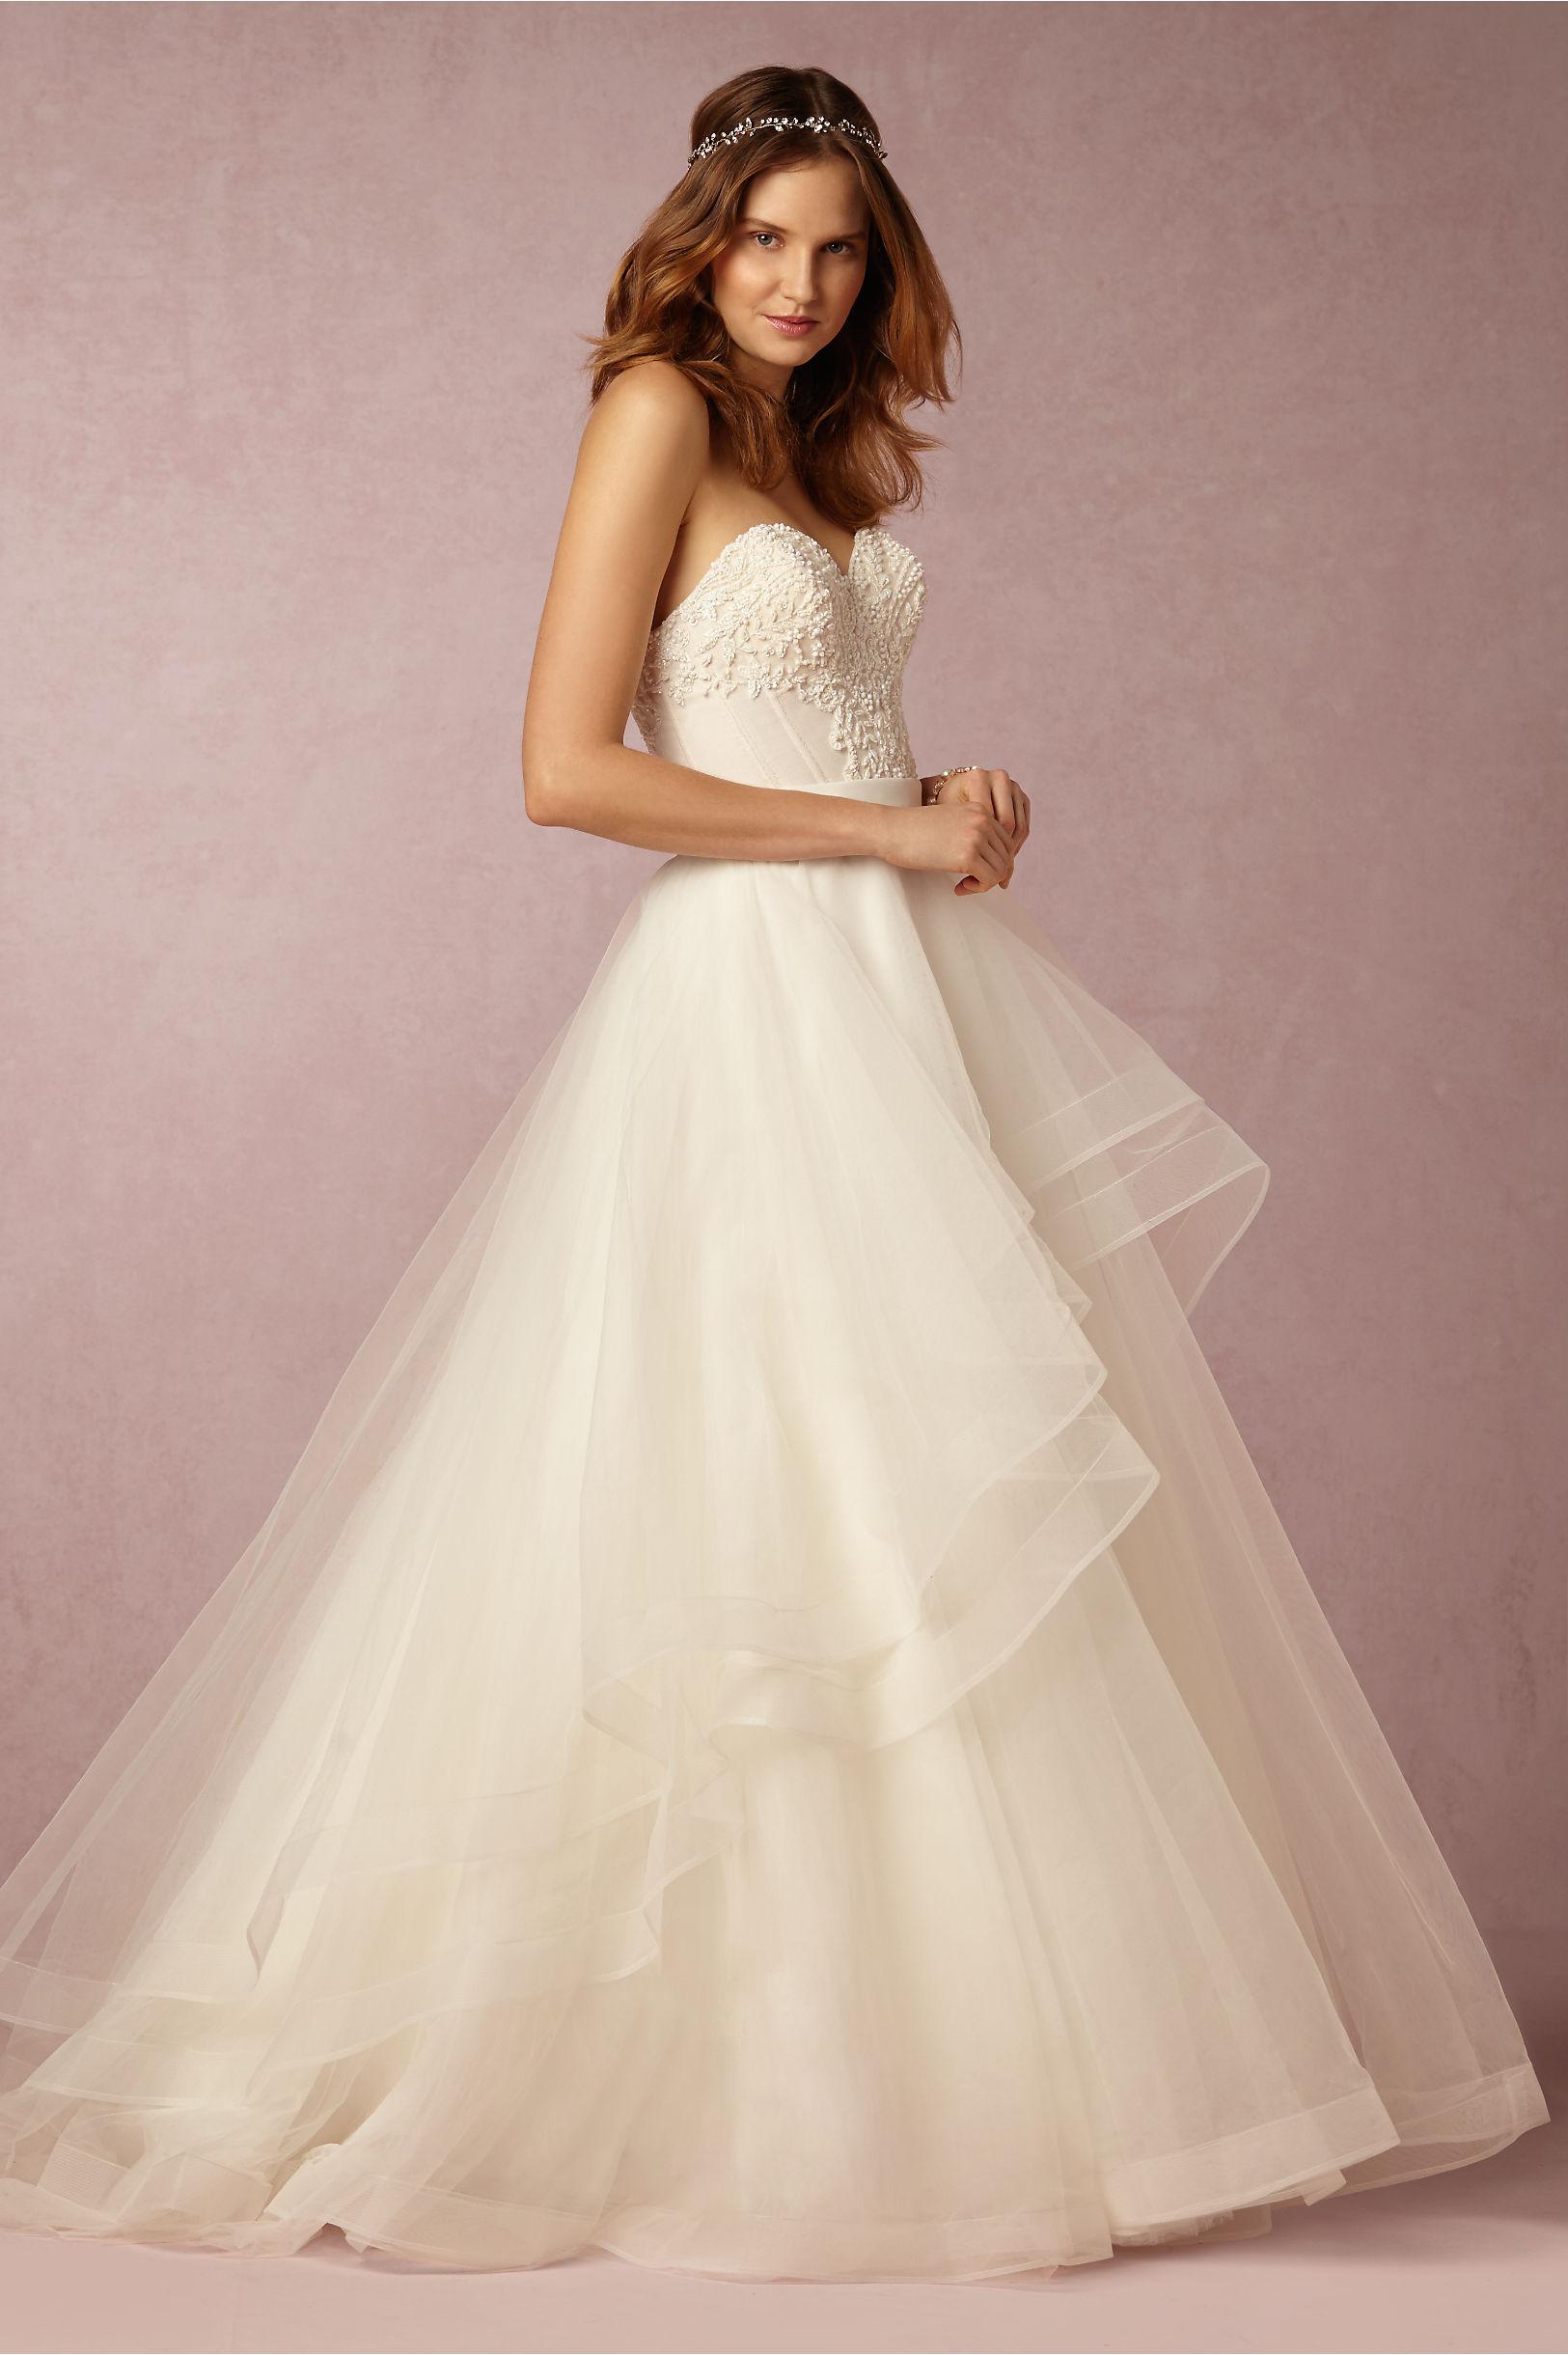 Tisha Corset & Almira Skirt in Bride   BHLDN